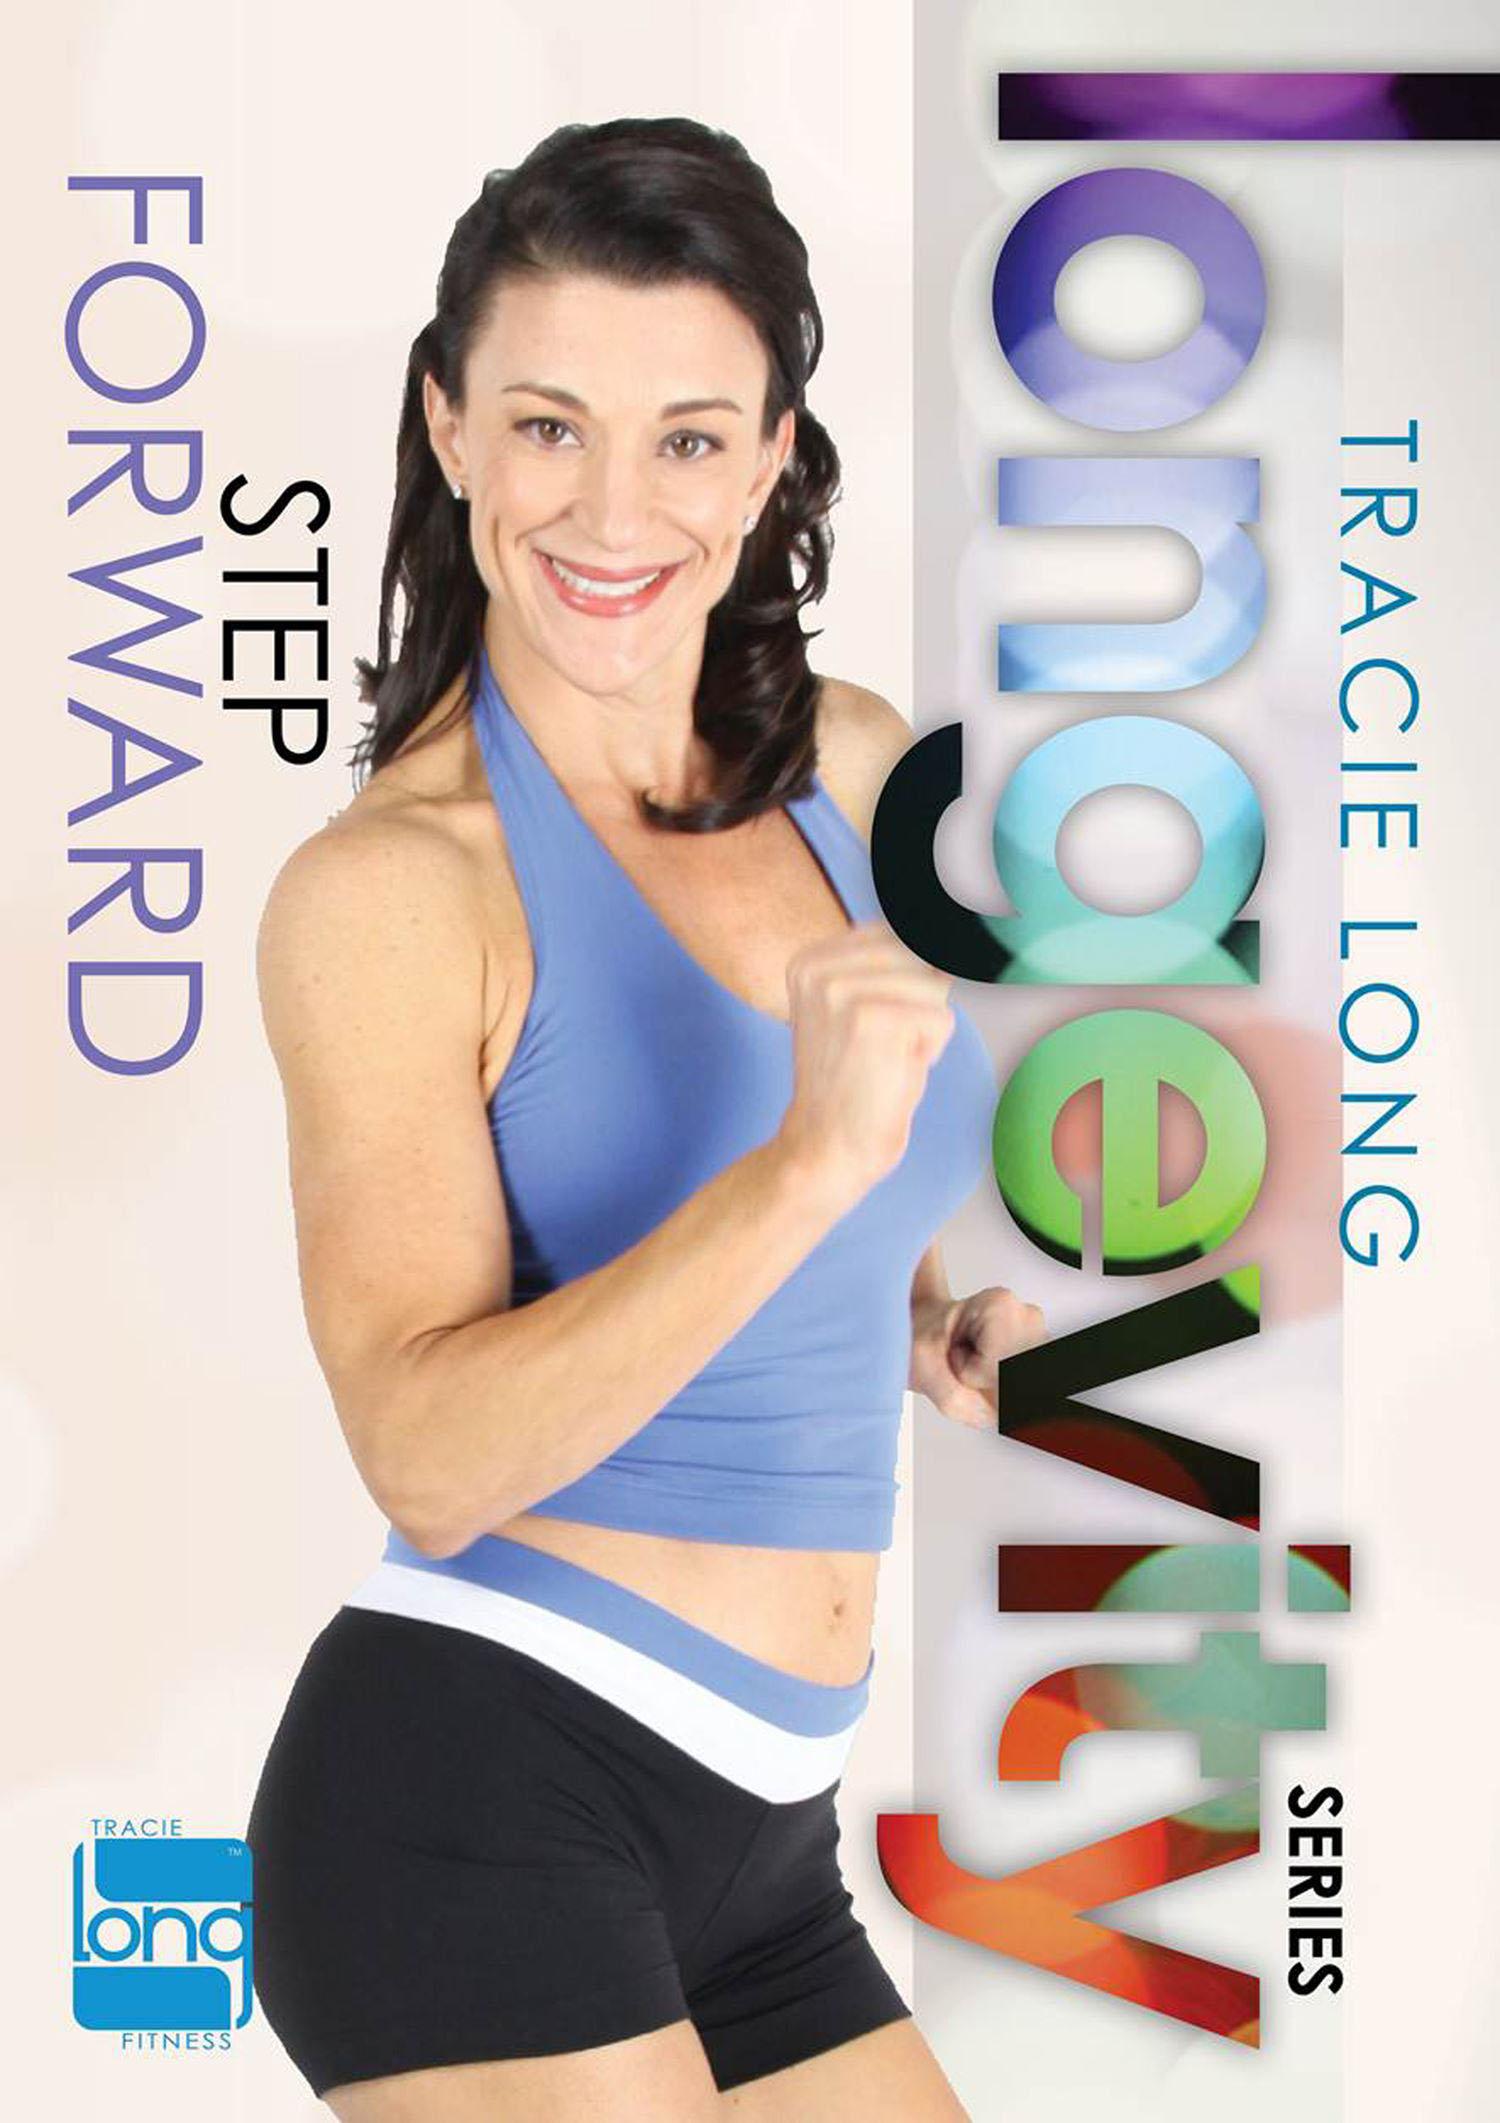 Tracie Long: Longevity Series - Step Forward